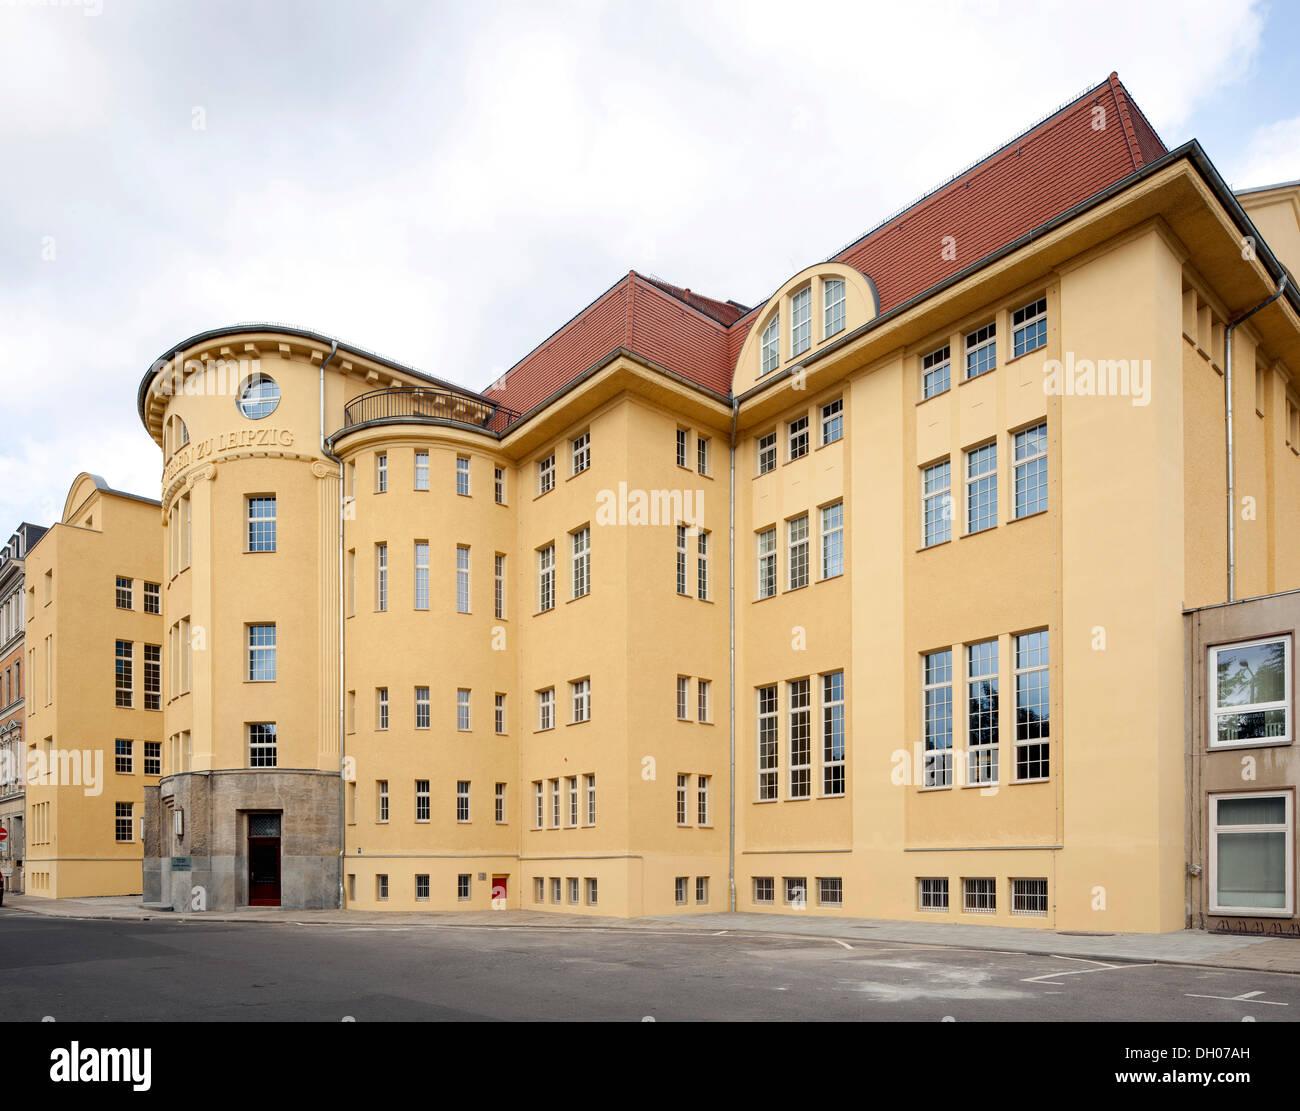 Sala de deportes en la calle Leplaystrasse, Leipzig, Sajonia, PublicGround Imagen De Stock